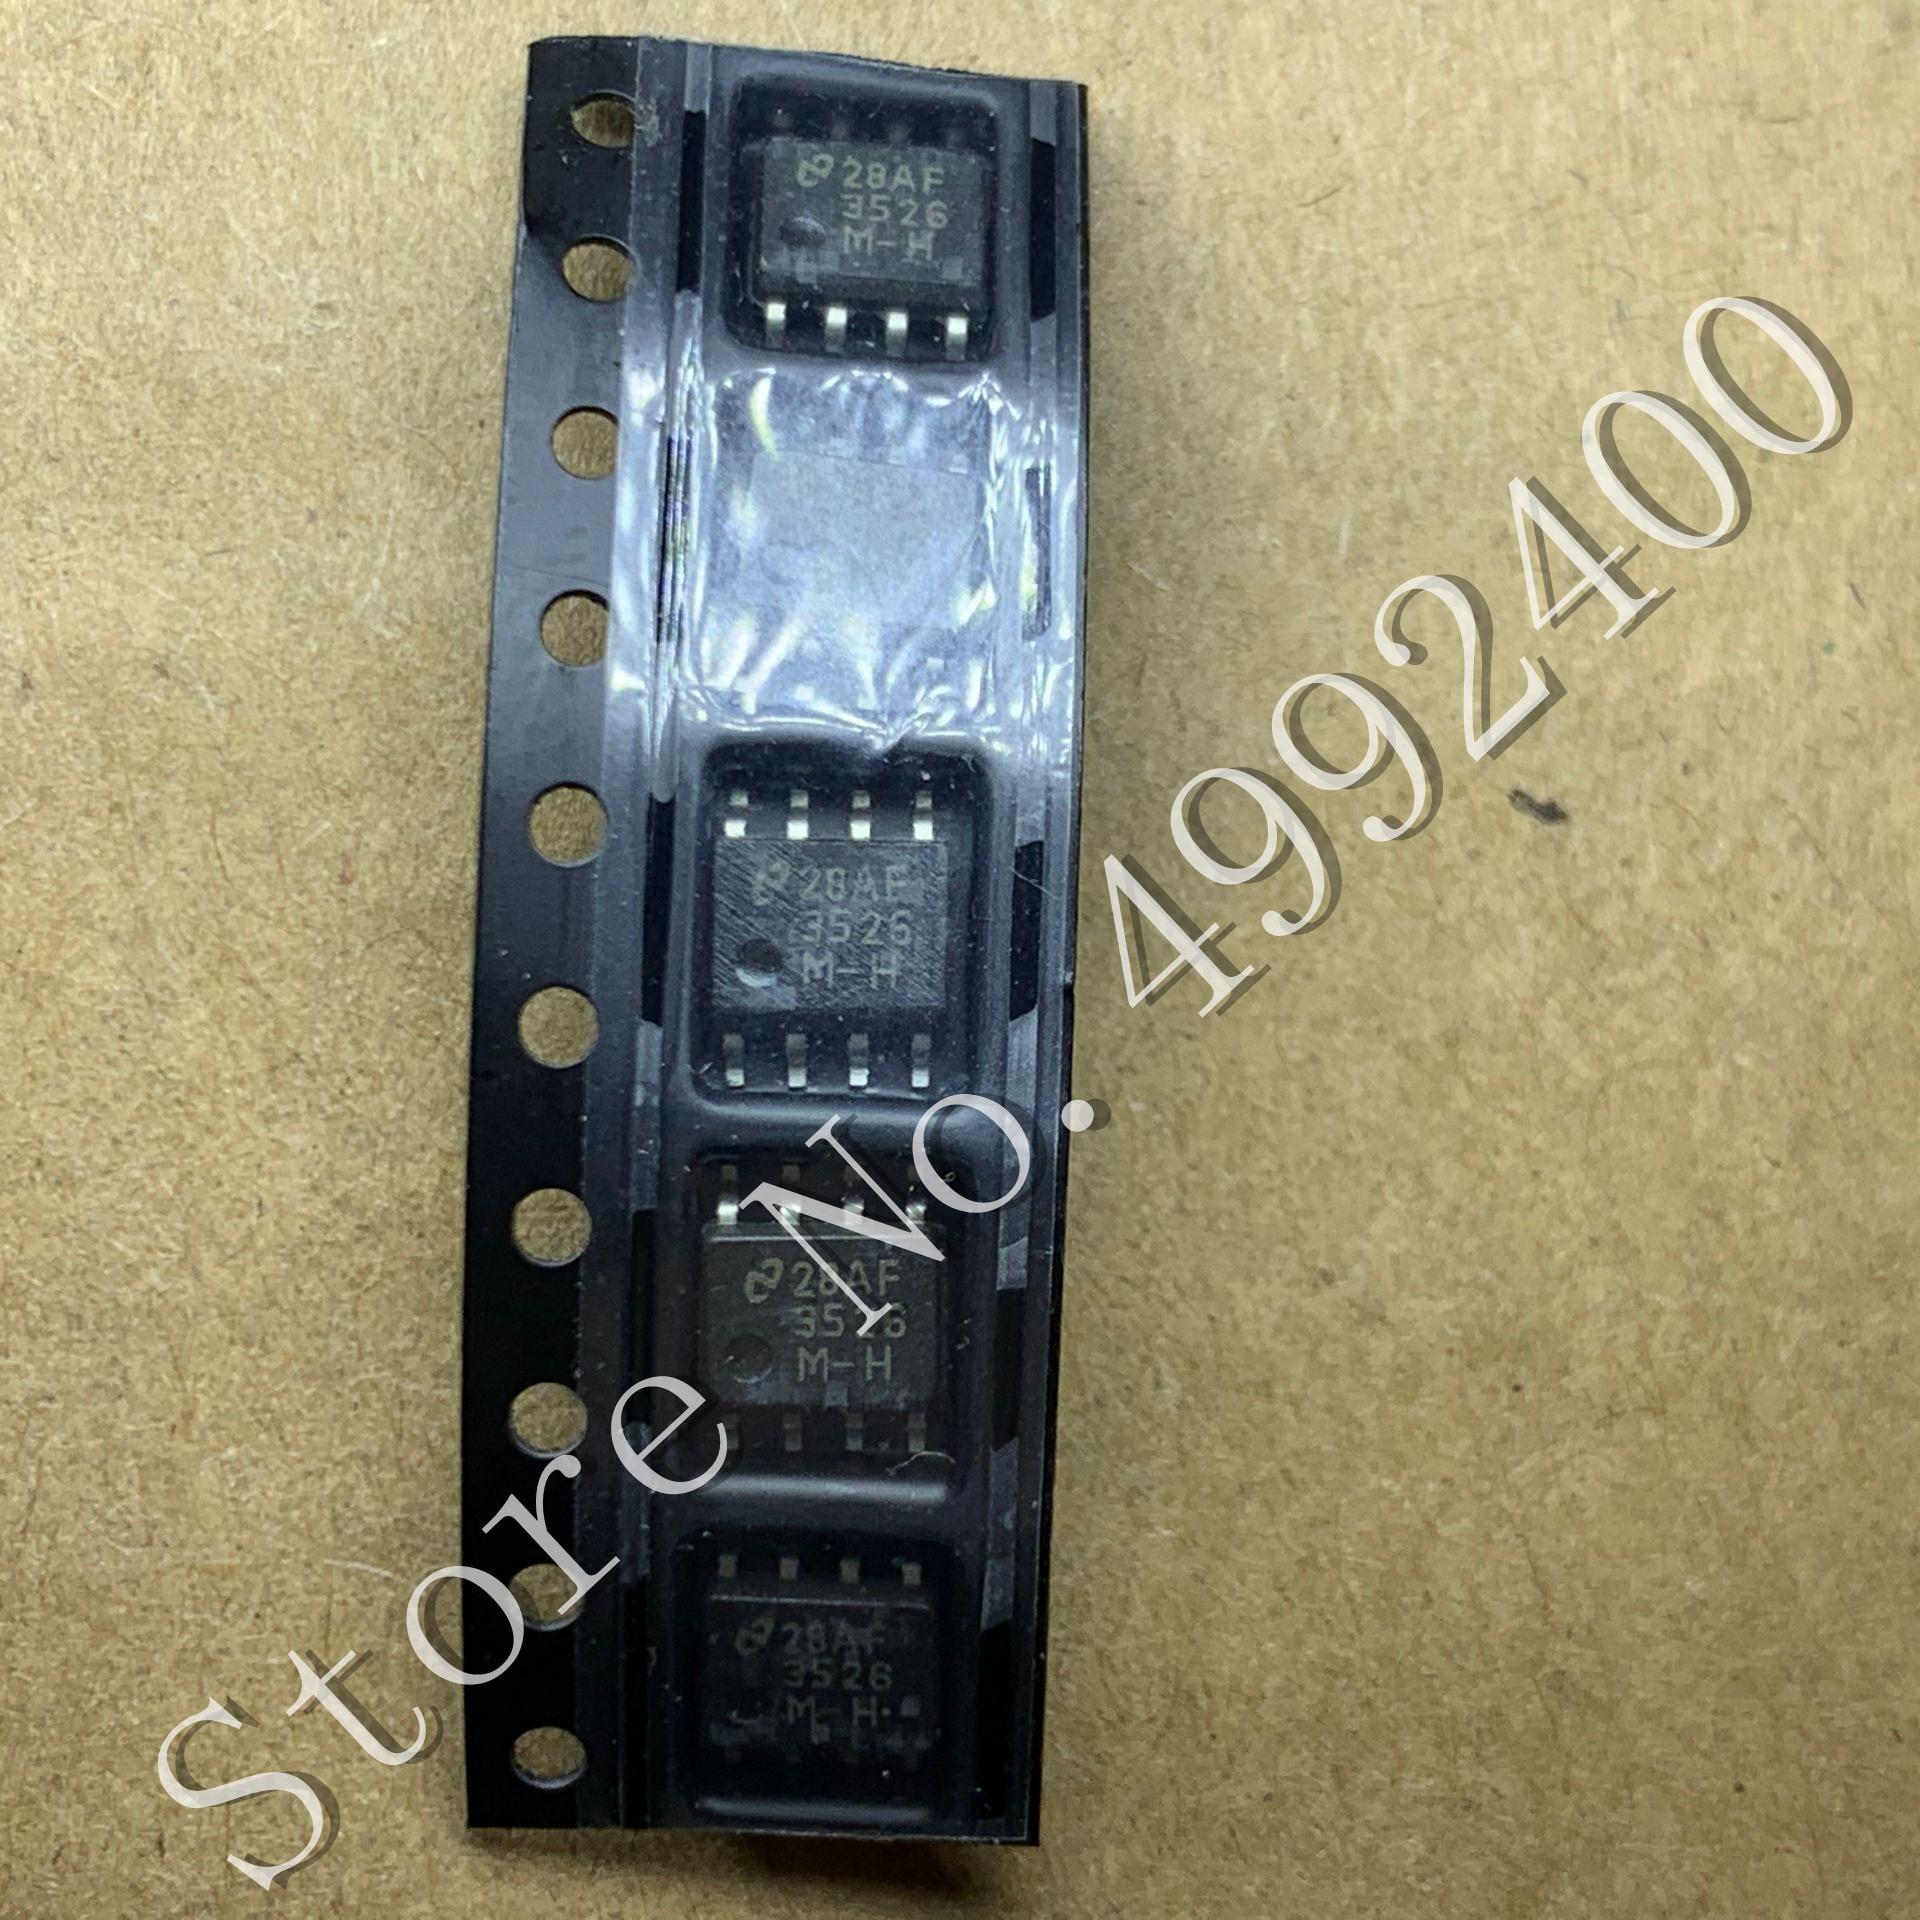 1 pçs/lote LM3526M-H 3526 M-H SOP8